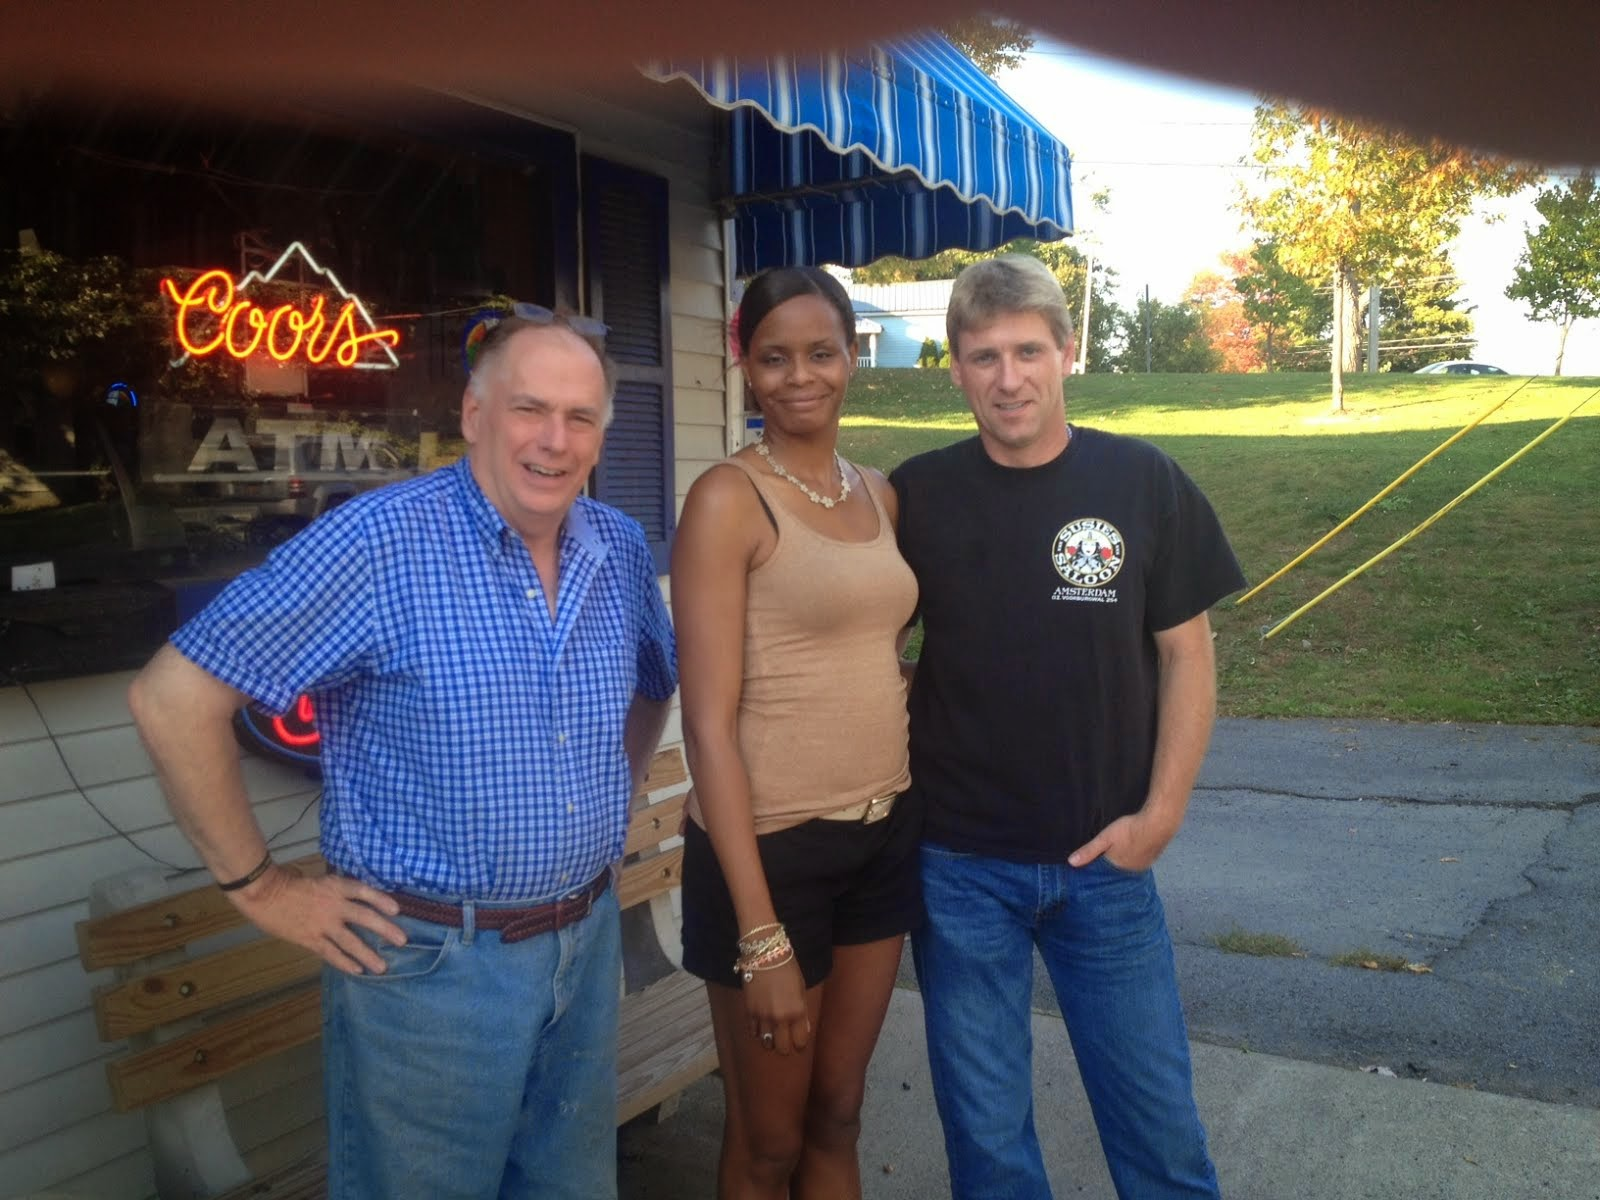 New Customers at the Pearl Street Pub